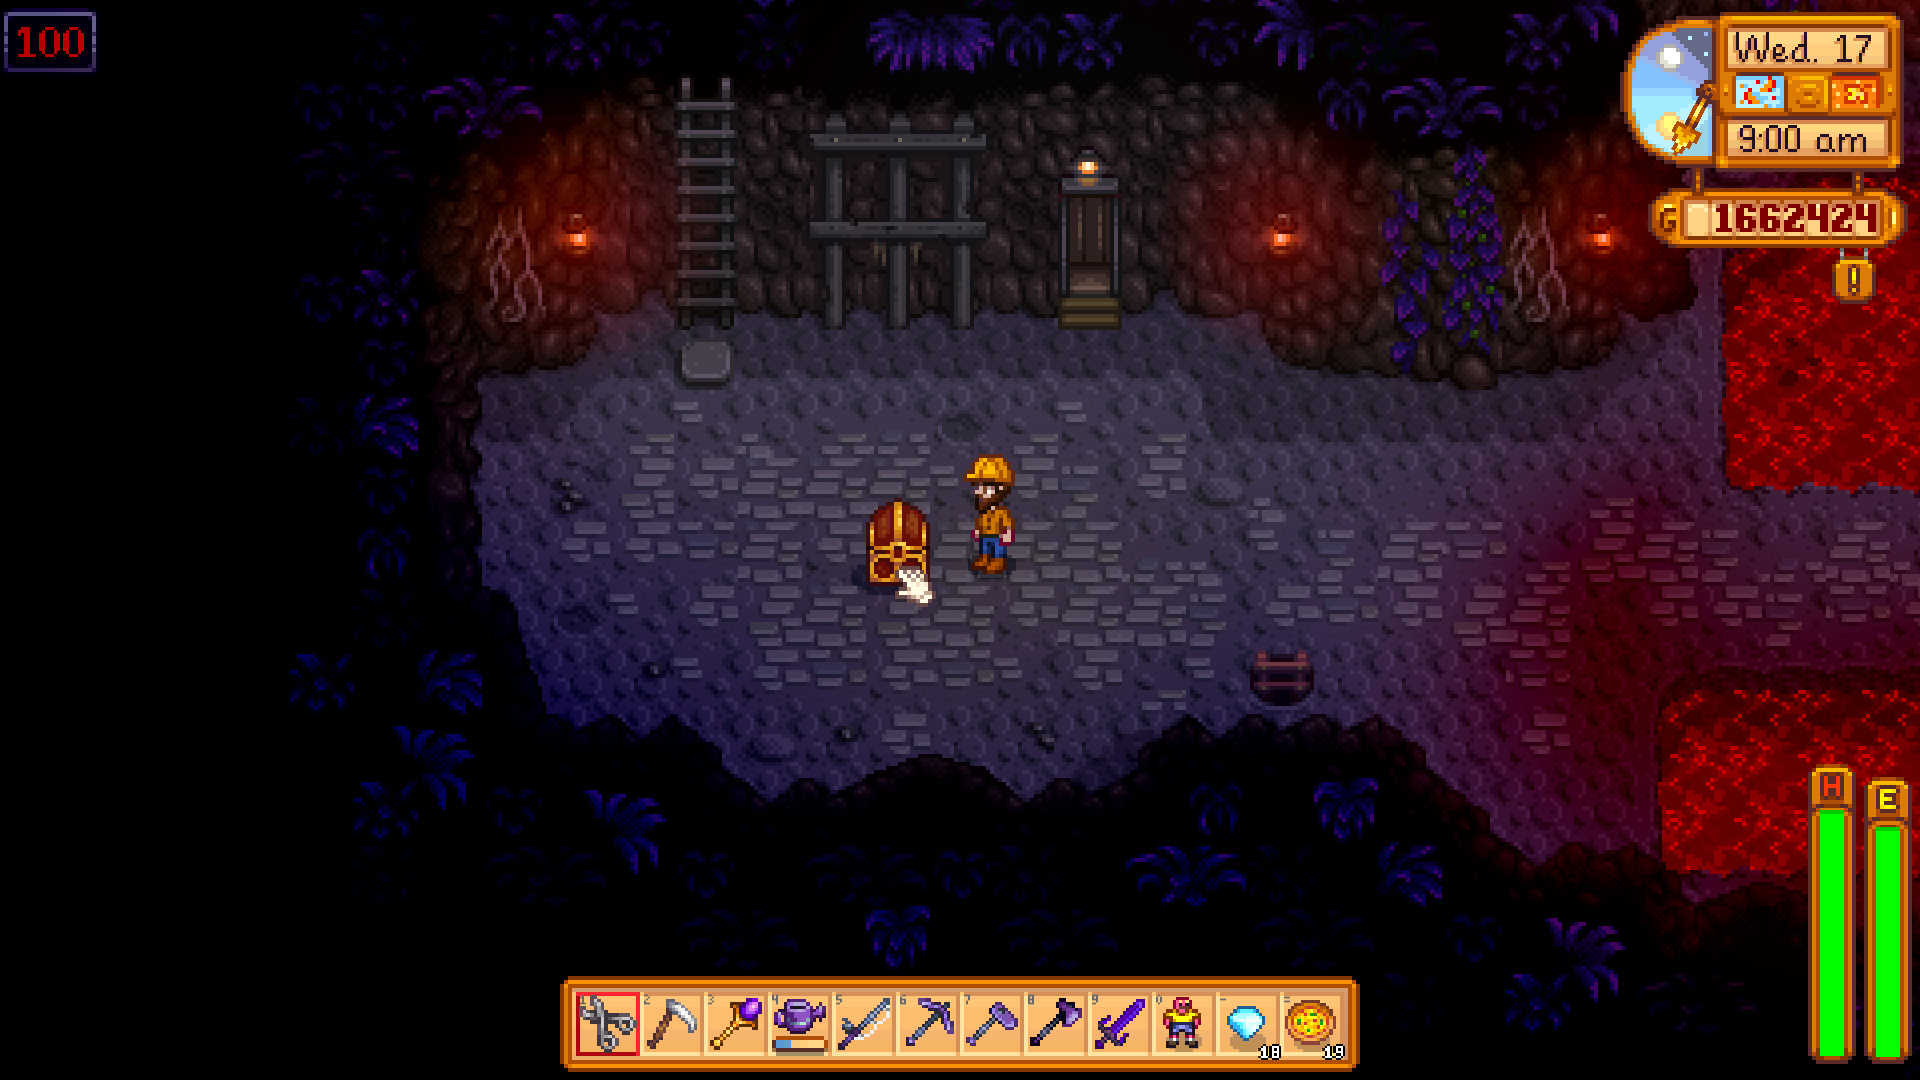 Stardrop #3 Location: Level 100 of Mines